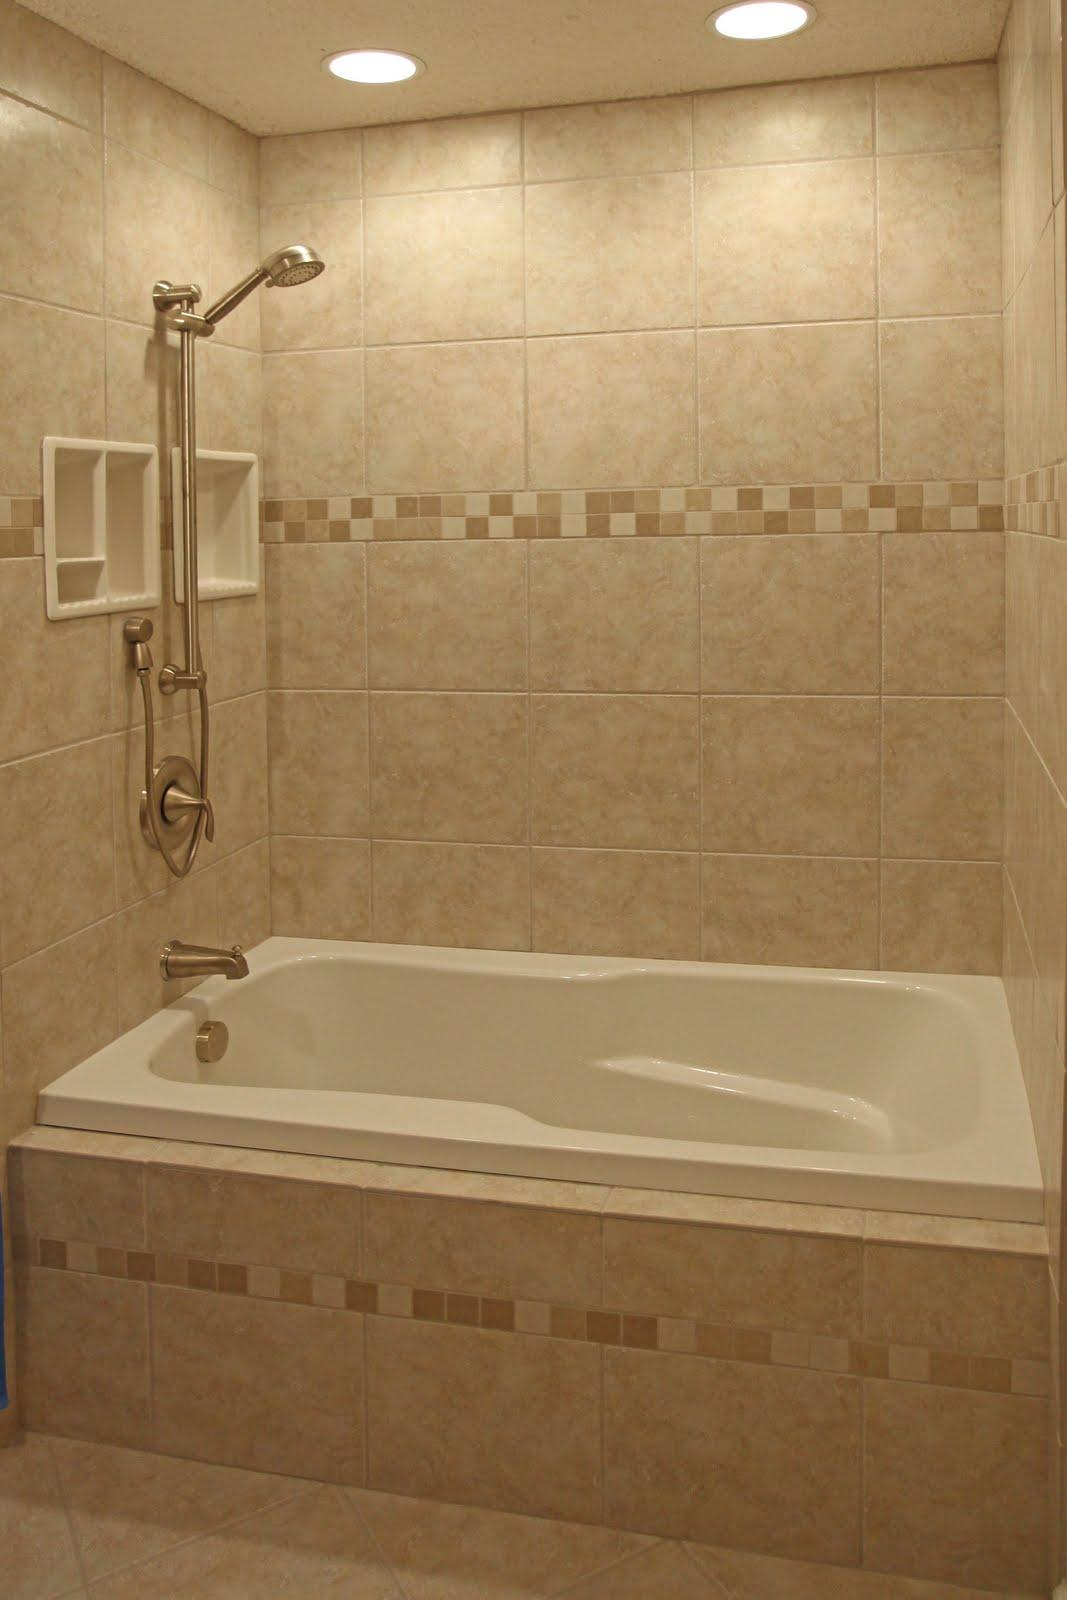 bathroom-tile-decorations-fijl